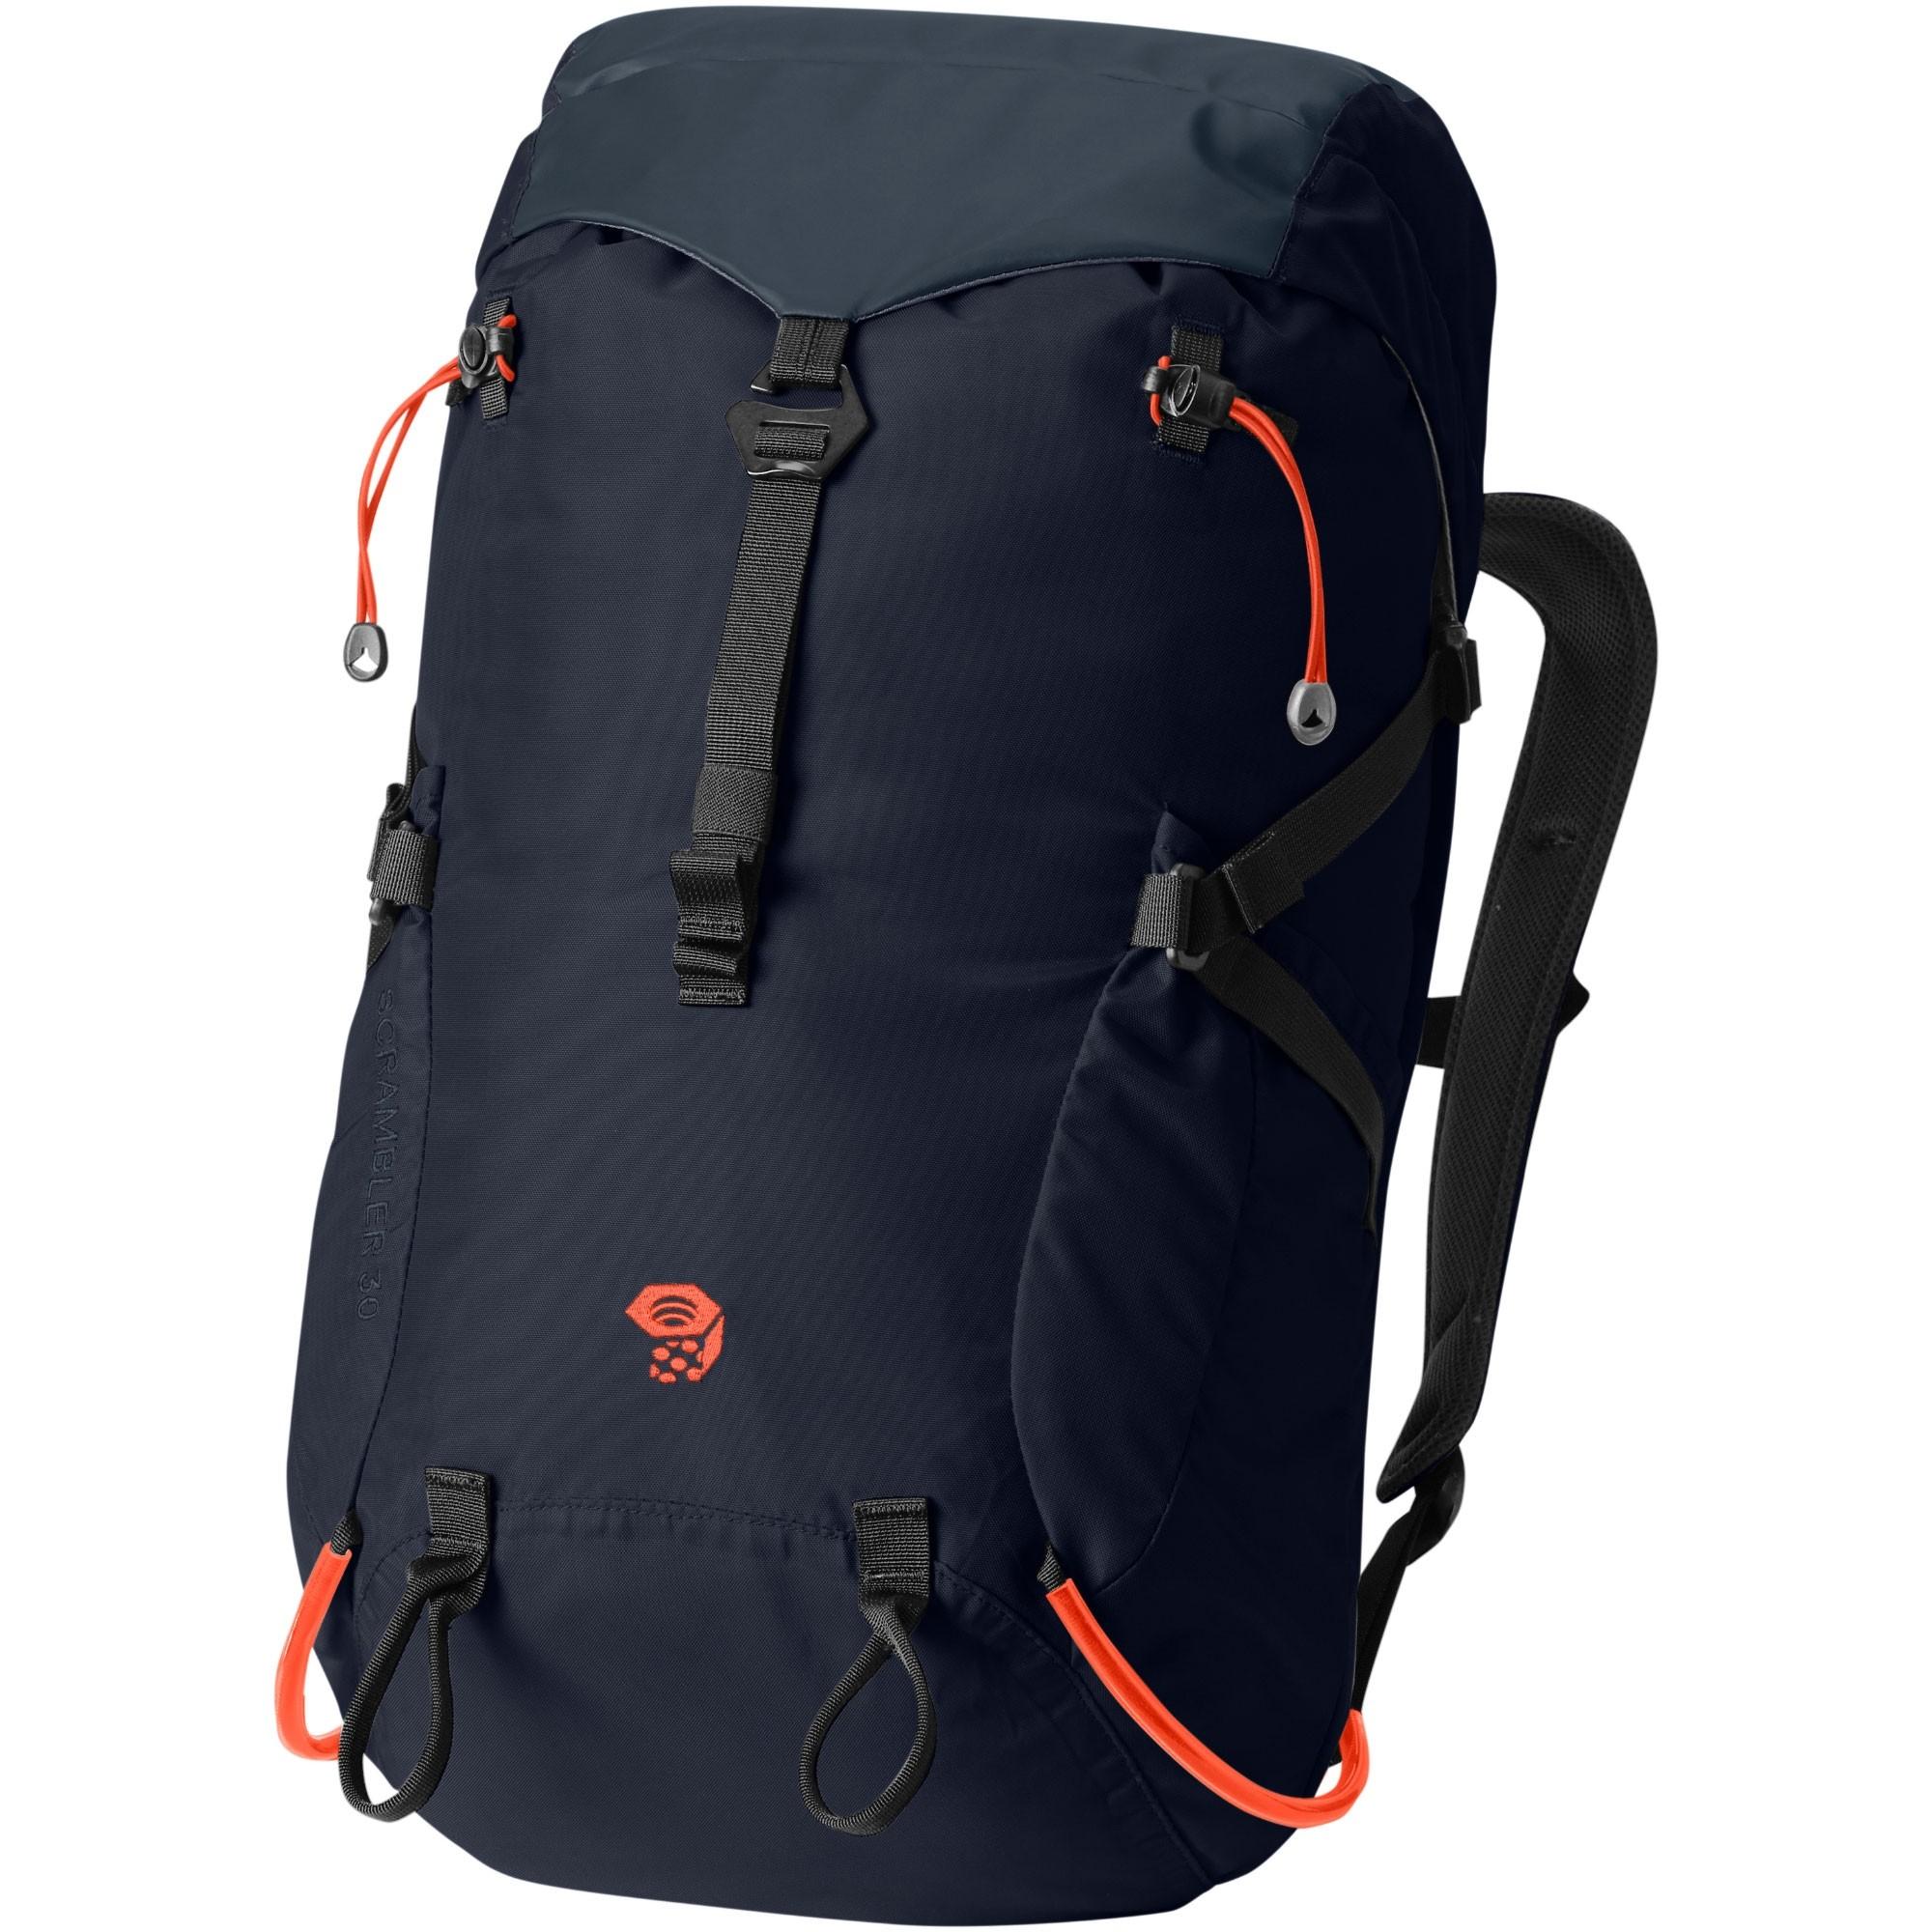 Mountain Hardwear Scrambler 30 OutDry Rucksack - Zinc